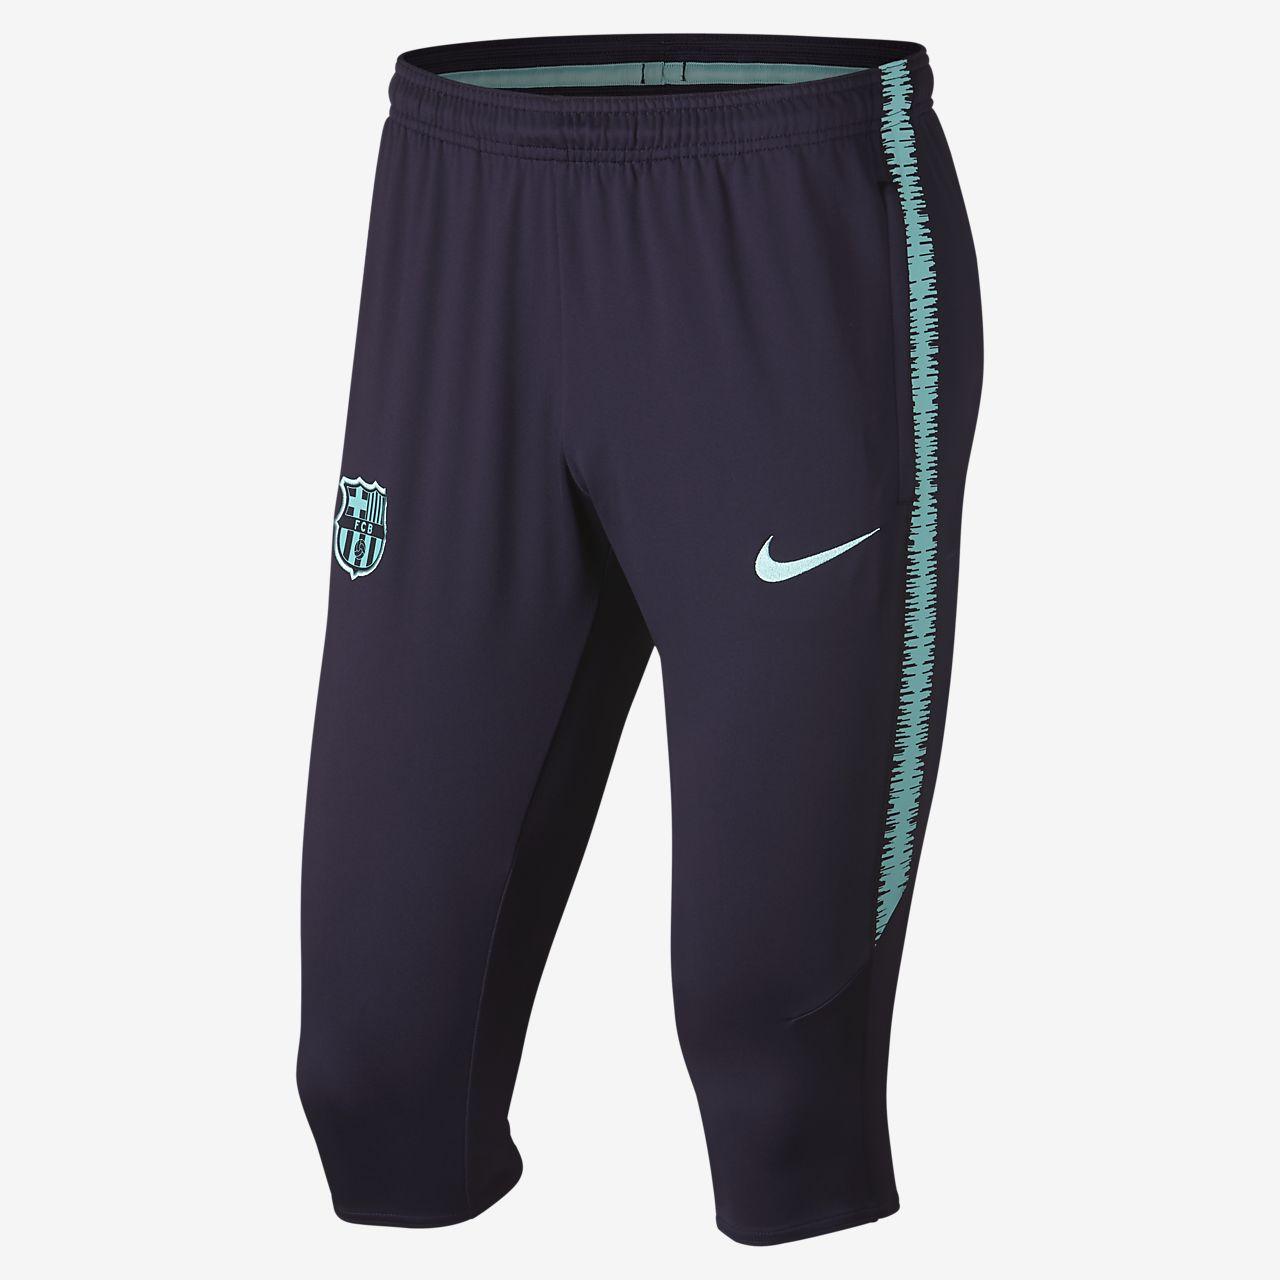 6b1f34be8 FC Barcelona Dri-FIT Squad Men s 3 4 Football Pants. Nike.com PT